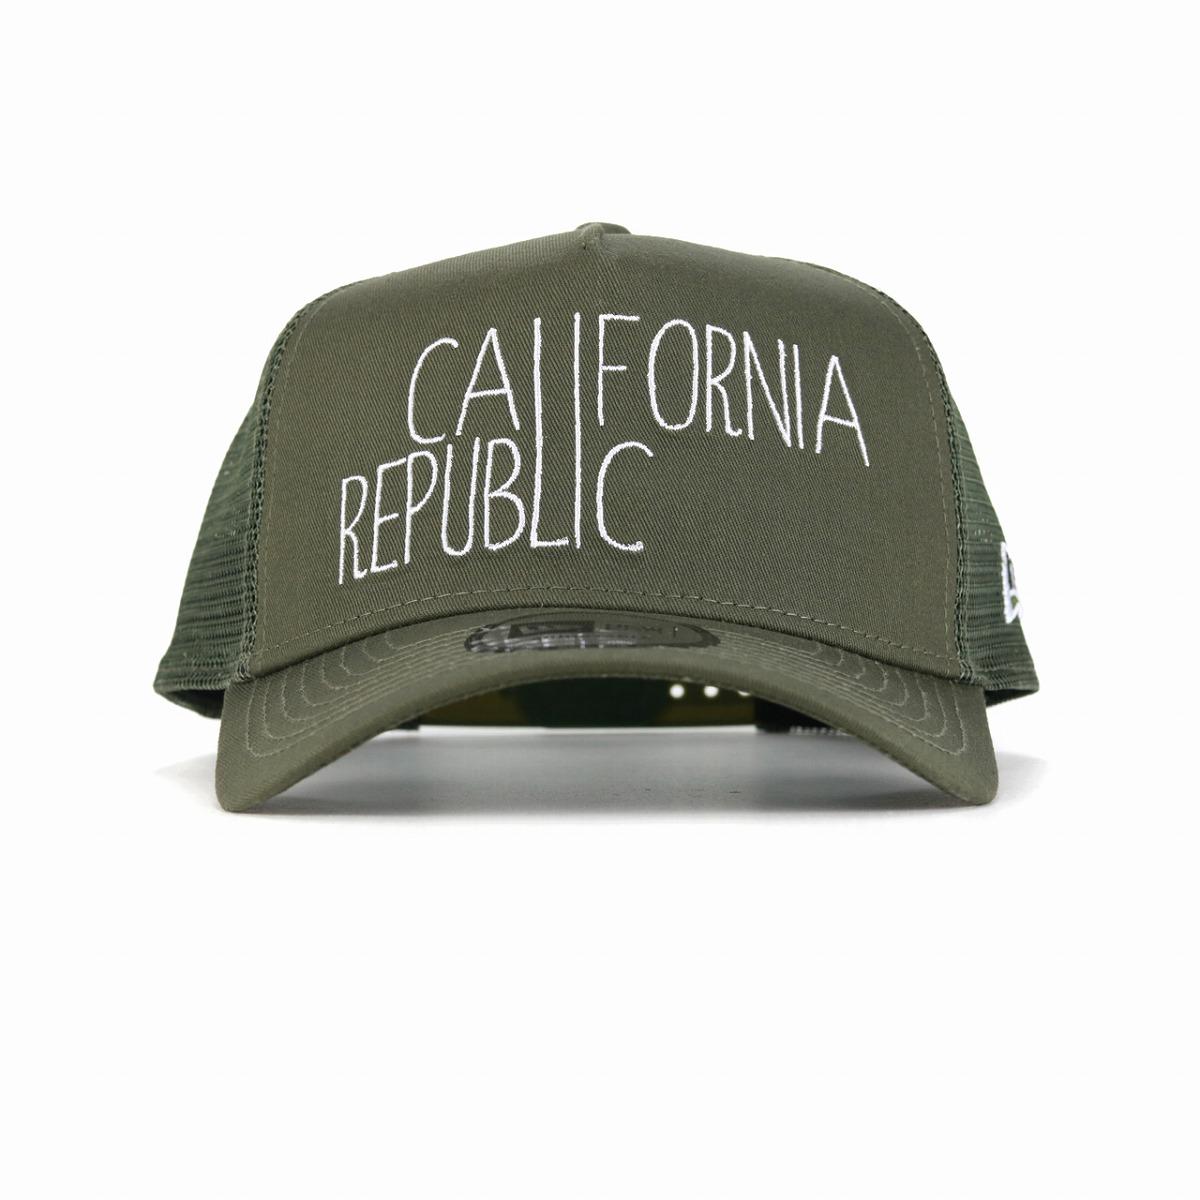 c04bf435601a0 ELEHELM HAT STORE  New gills cap men s awning logo cap mesh NEWERA ...